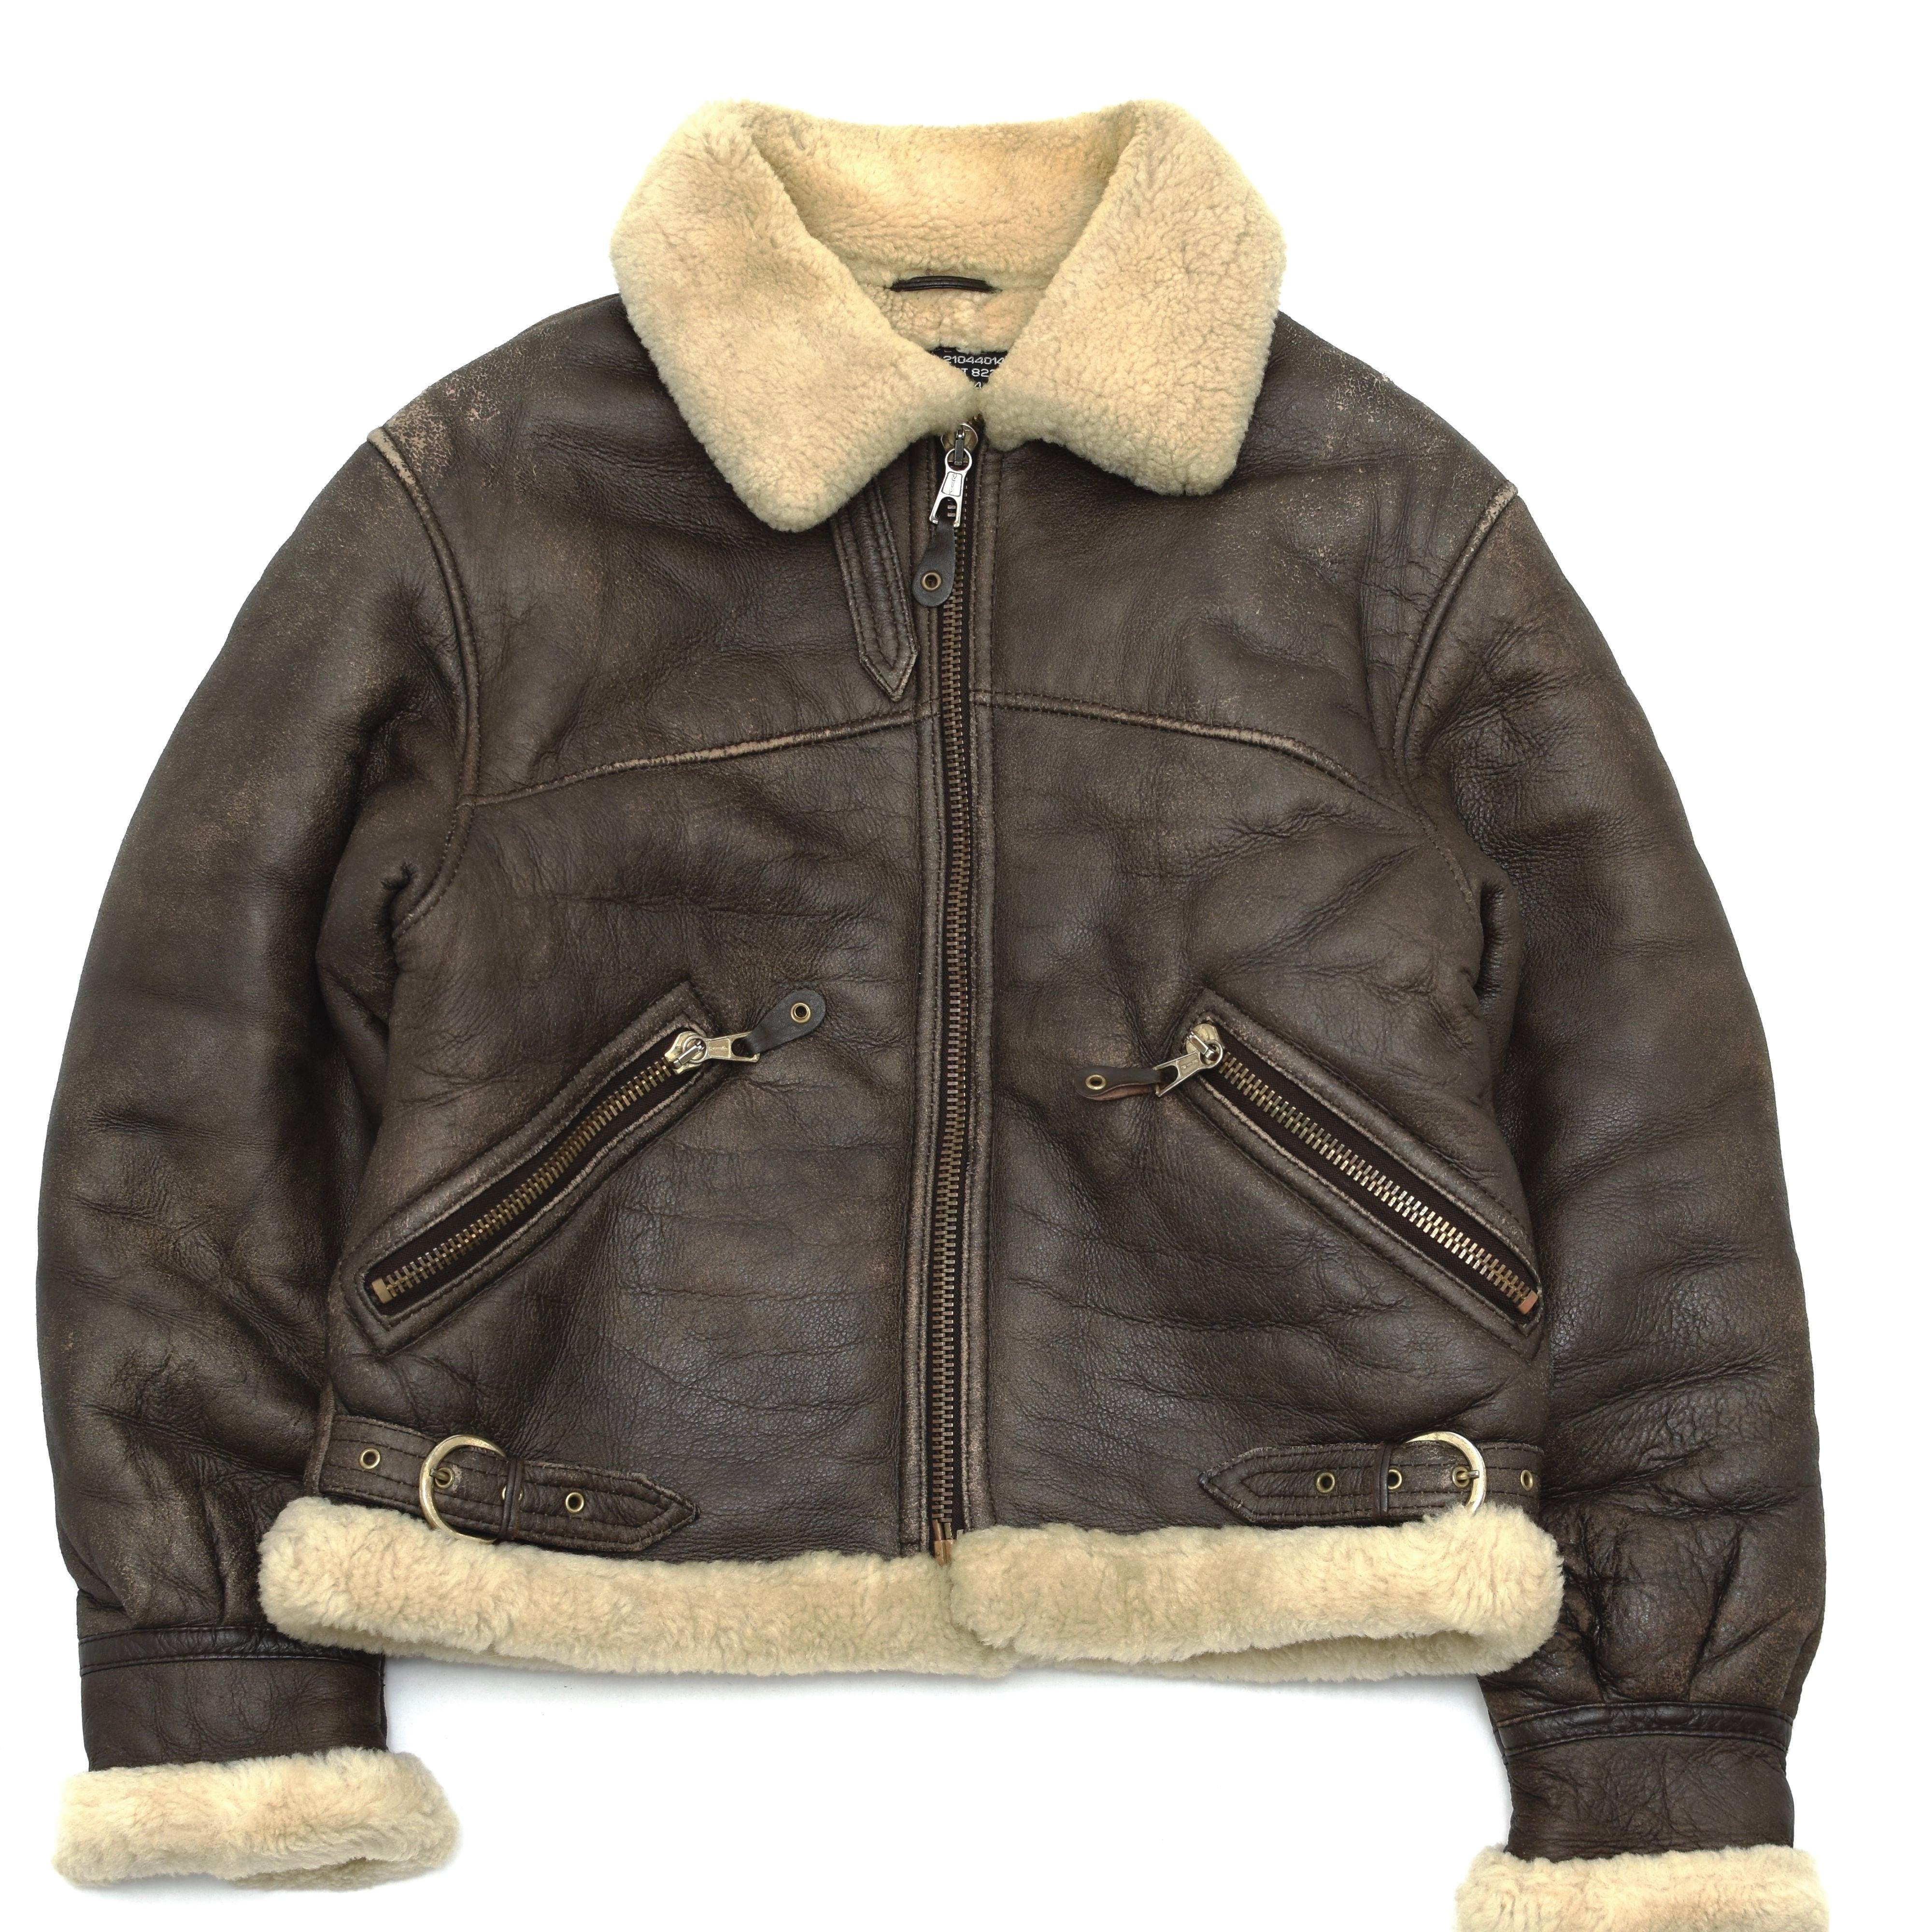 Vintage Mouton Leather Boa Jacket TYPE B-9